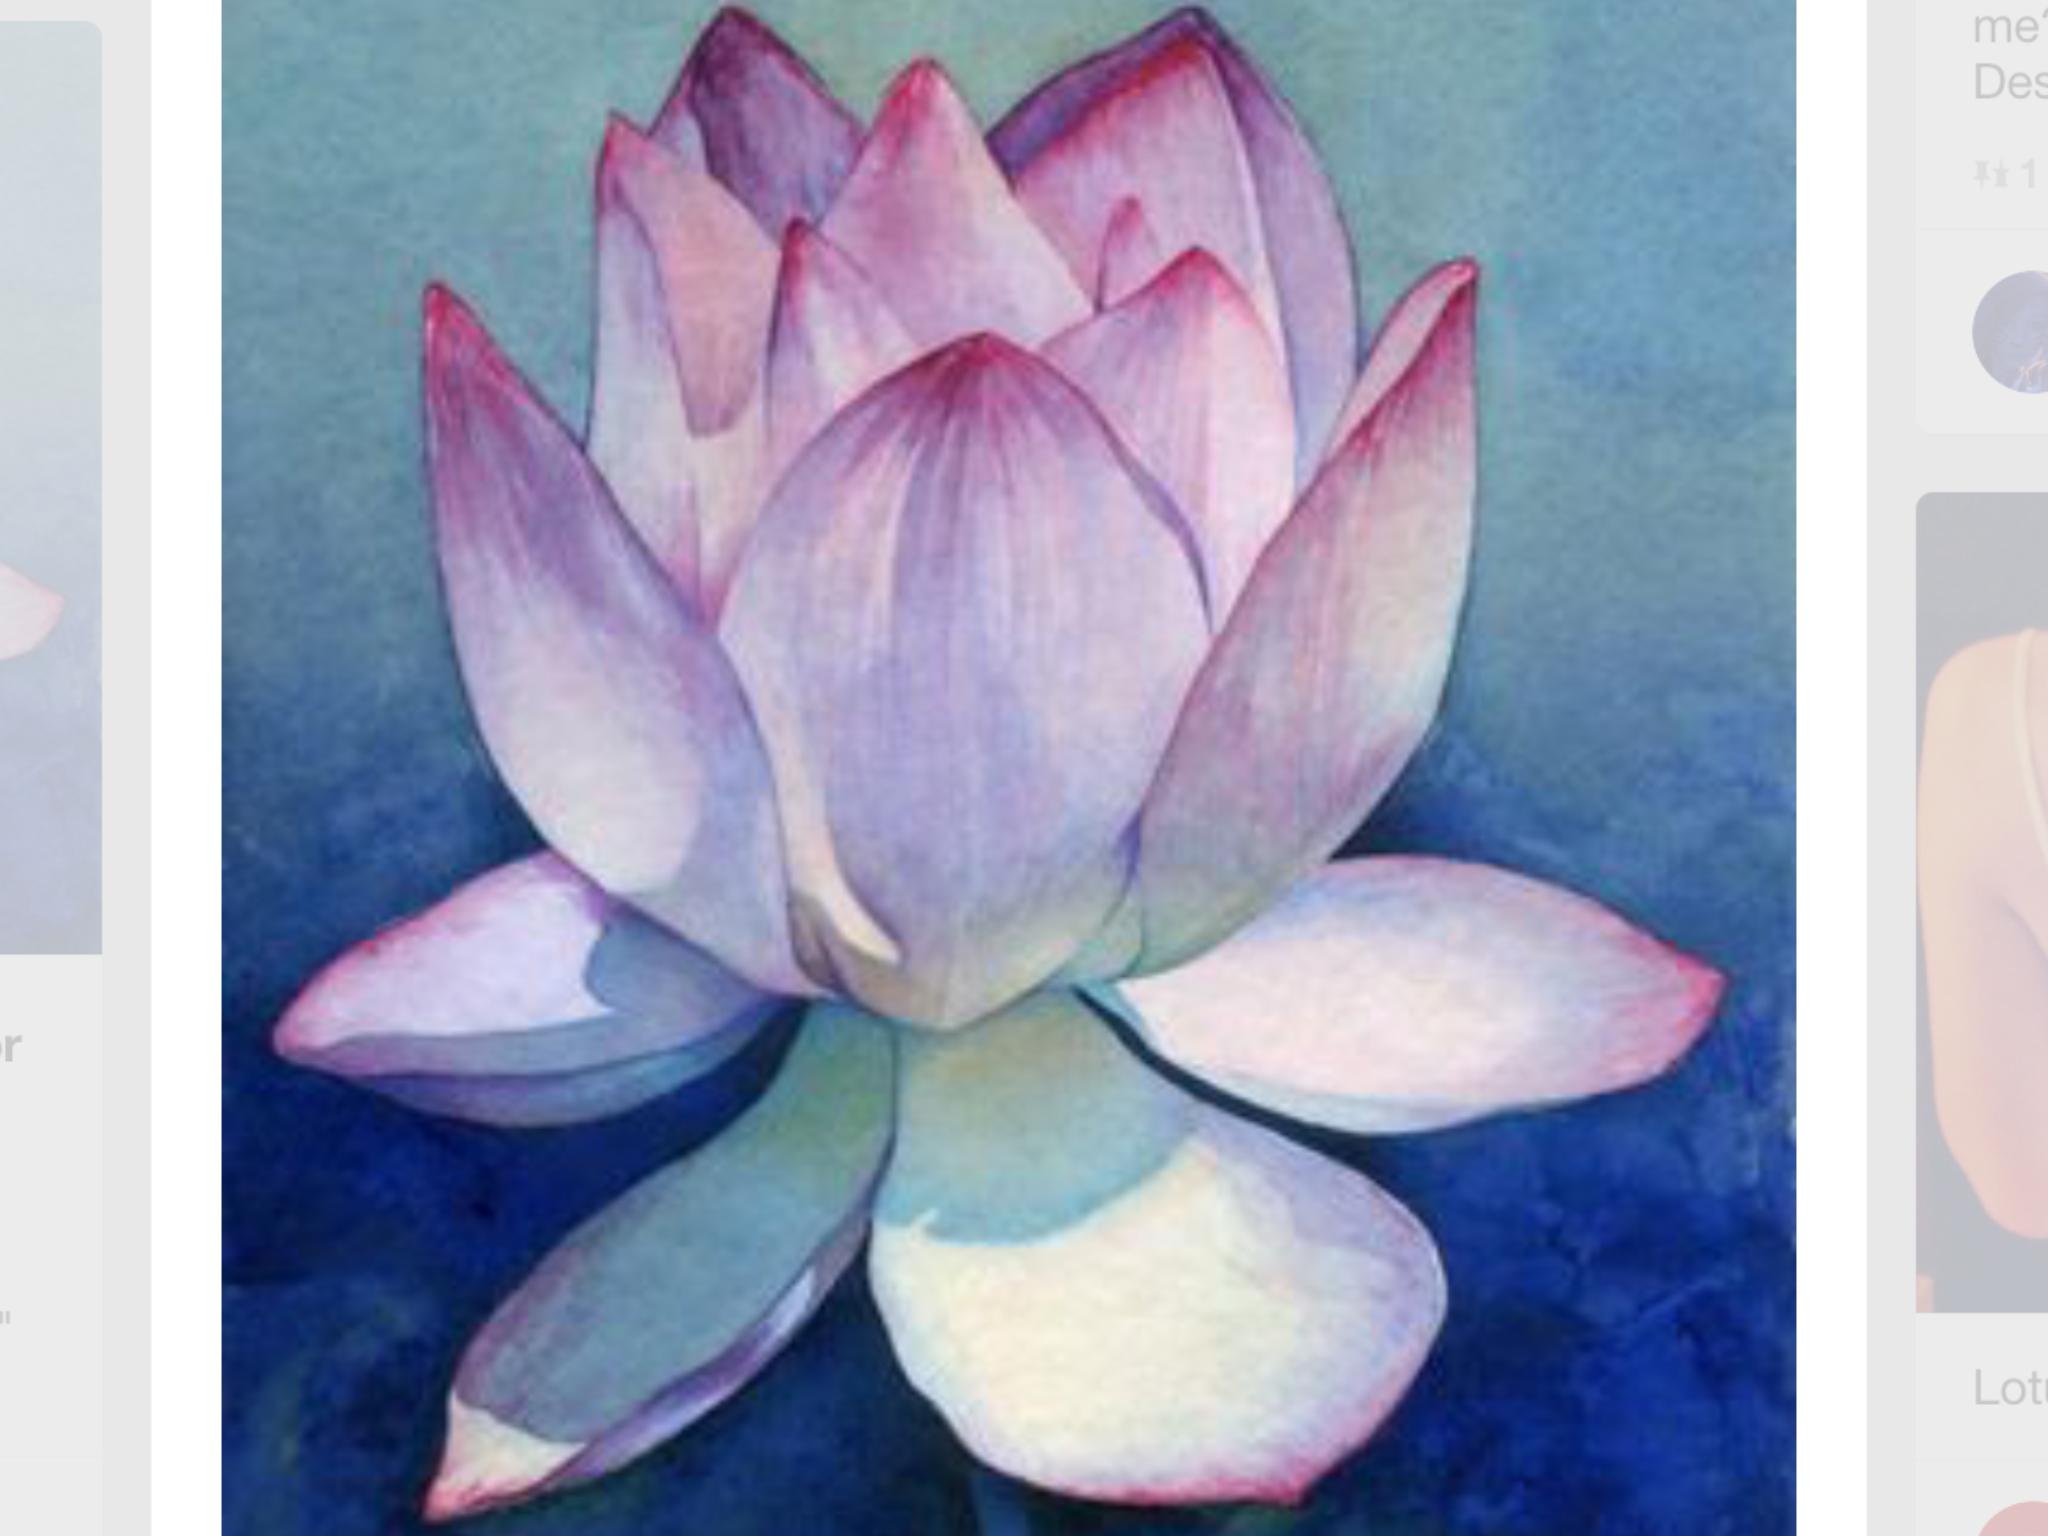 Pin By Susan Coyne On Paint Me A Winner In 2019 Watercolor Art